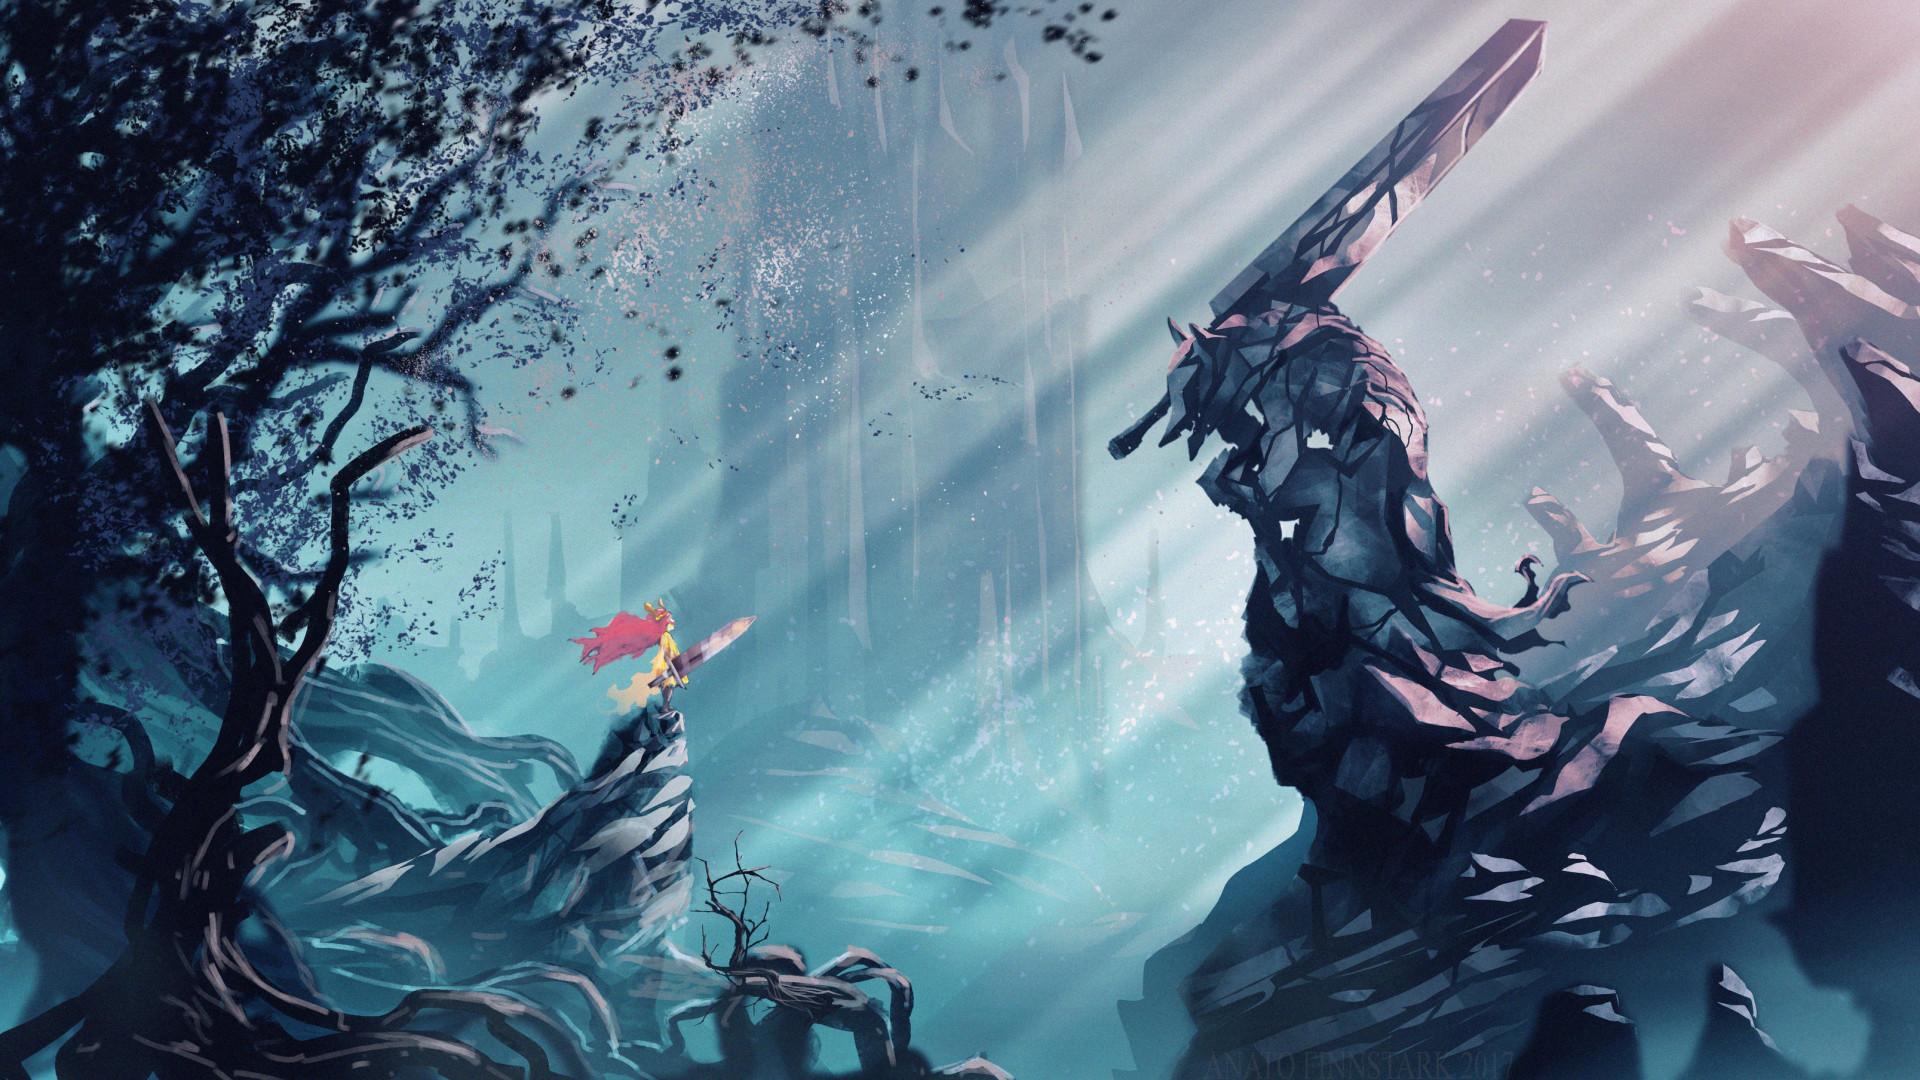 Халява: Ubisoft дарит отличный платформер Child of Light для PC